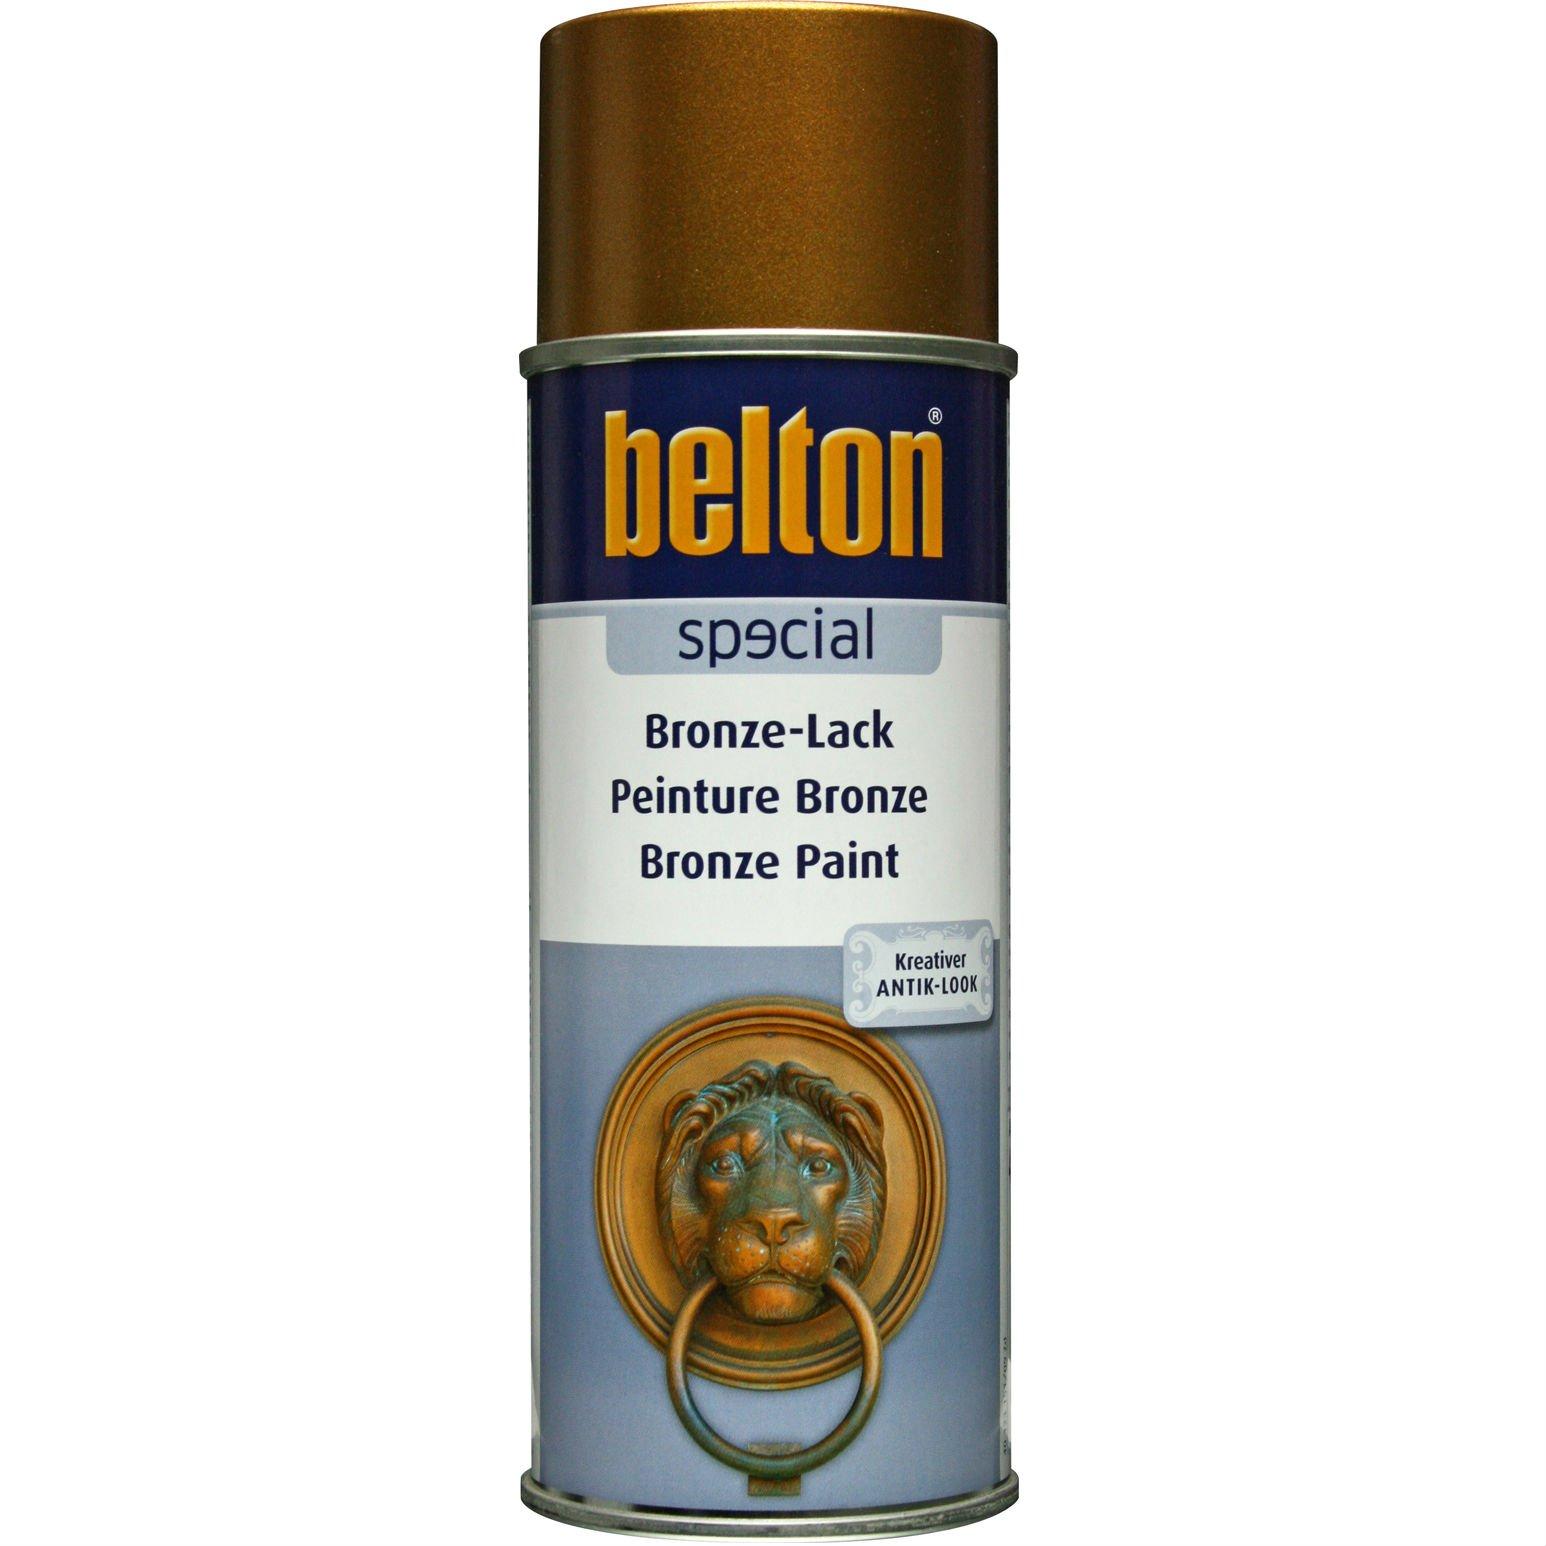 Belton bronzelak antikguld